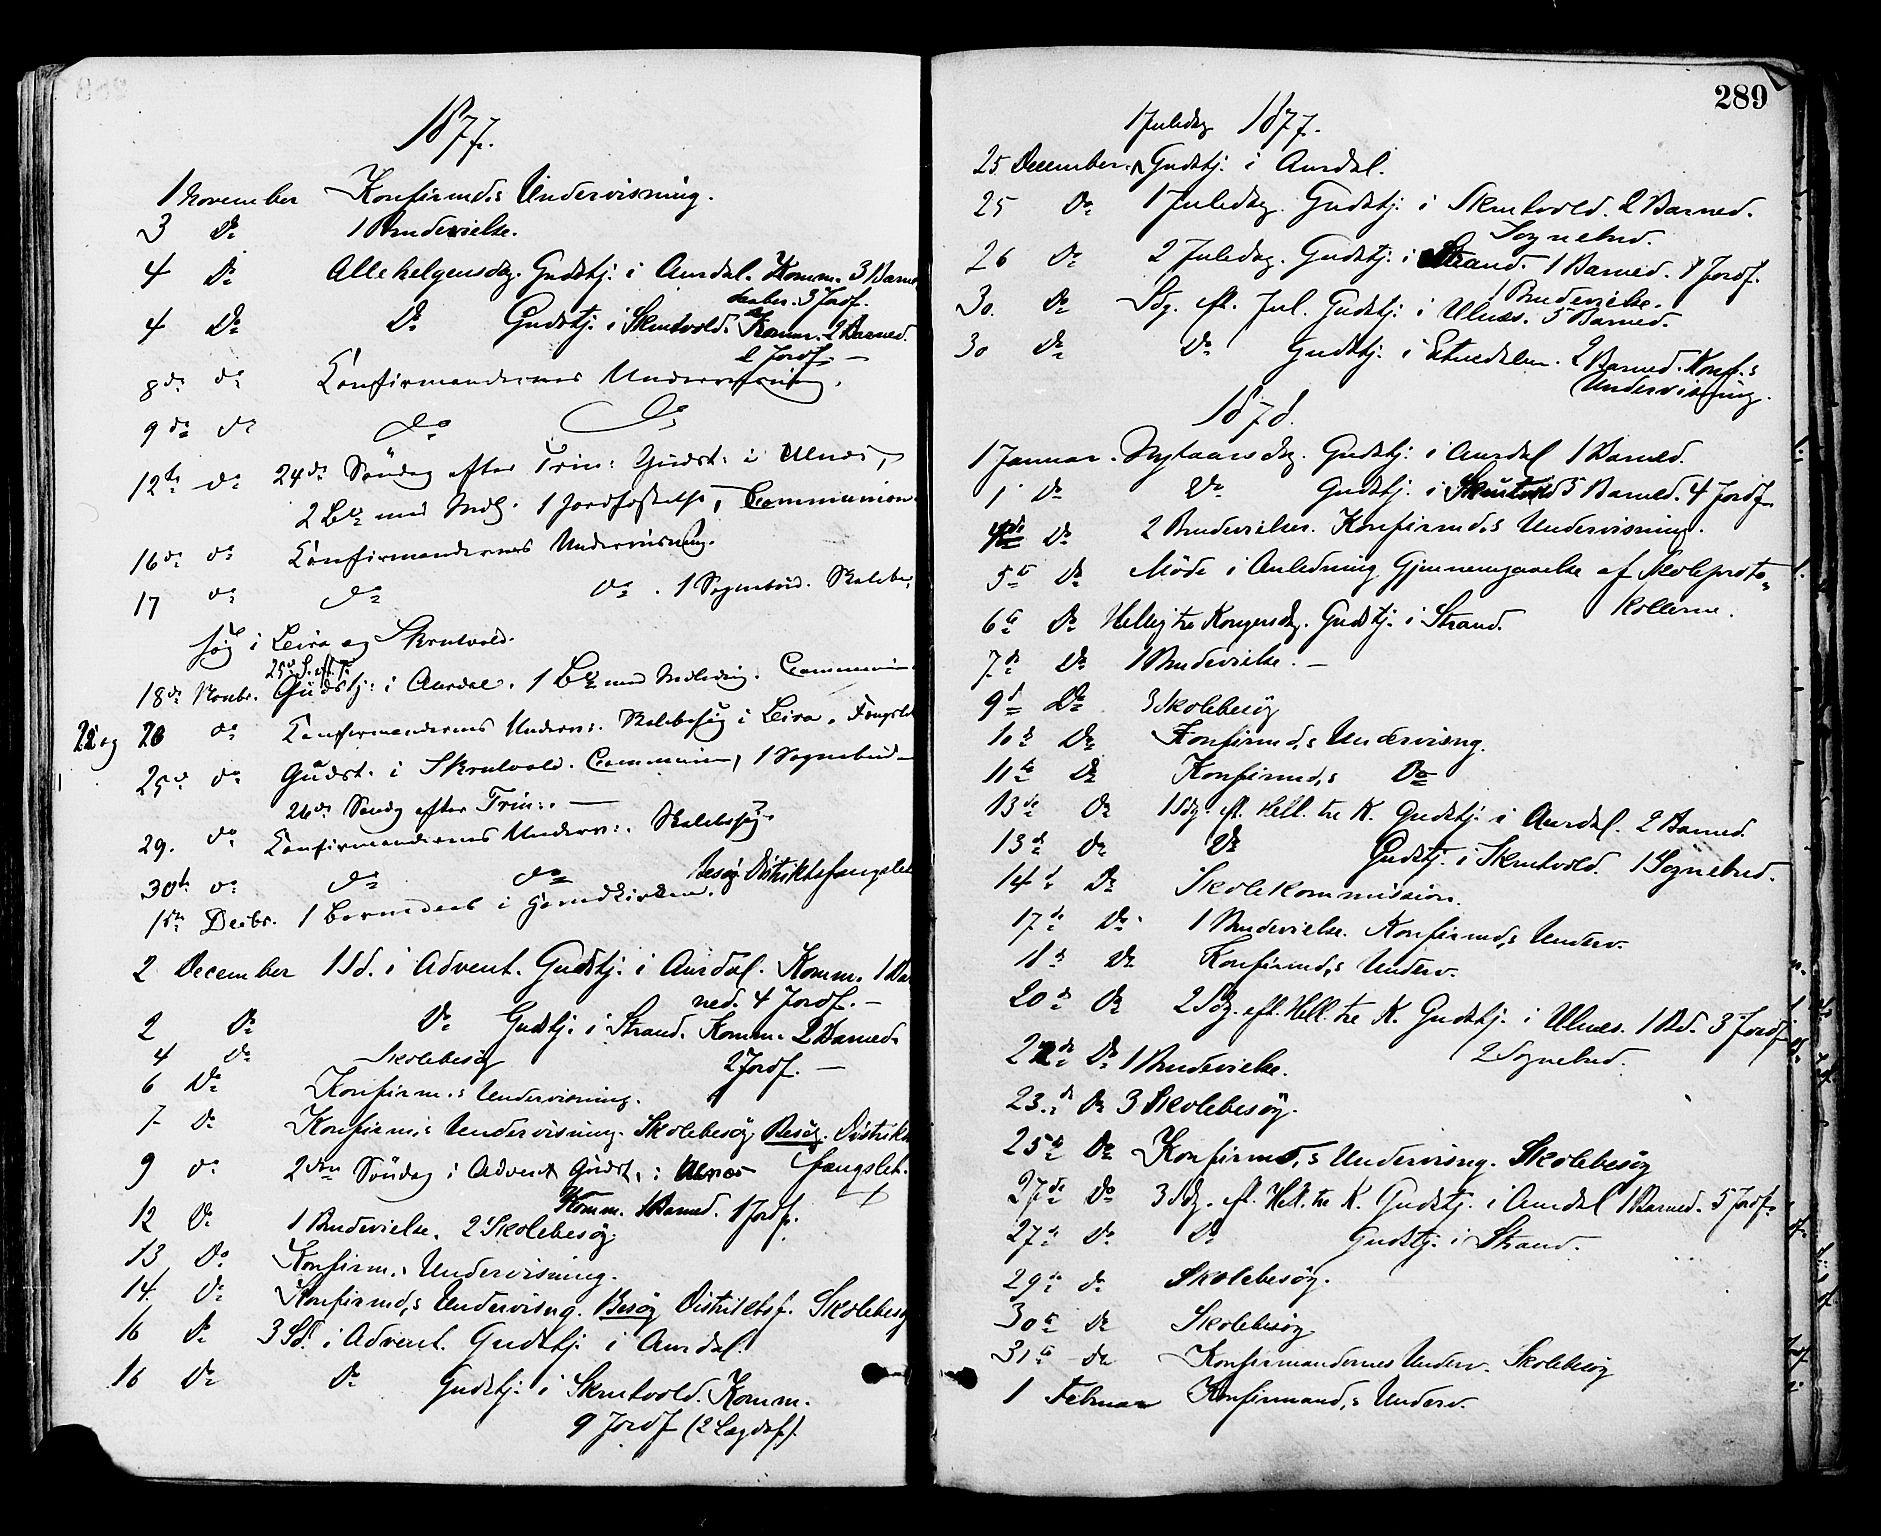 SAH, Nord-Aurdal prestekontor, Ministerialbok nr. 9, 1876-1882, s. 289